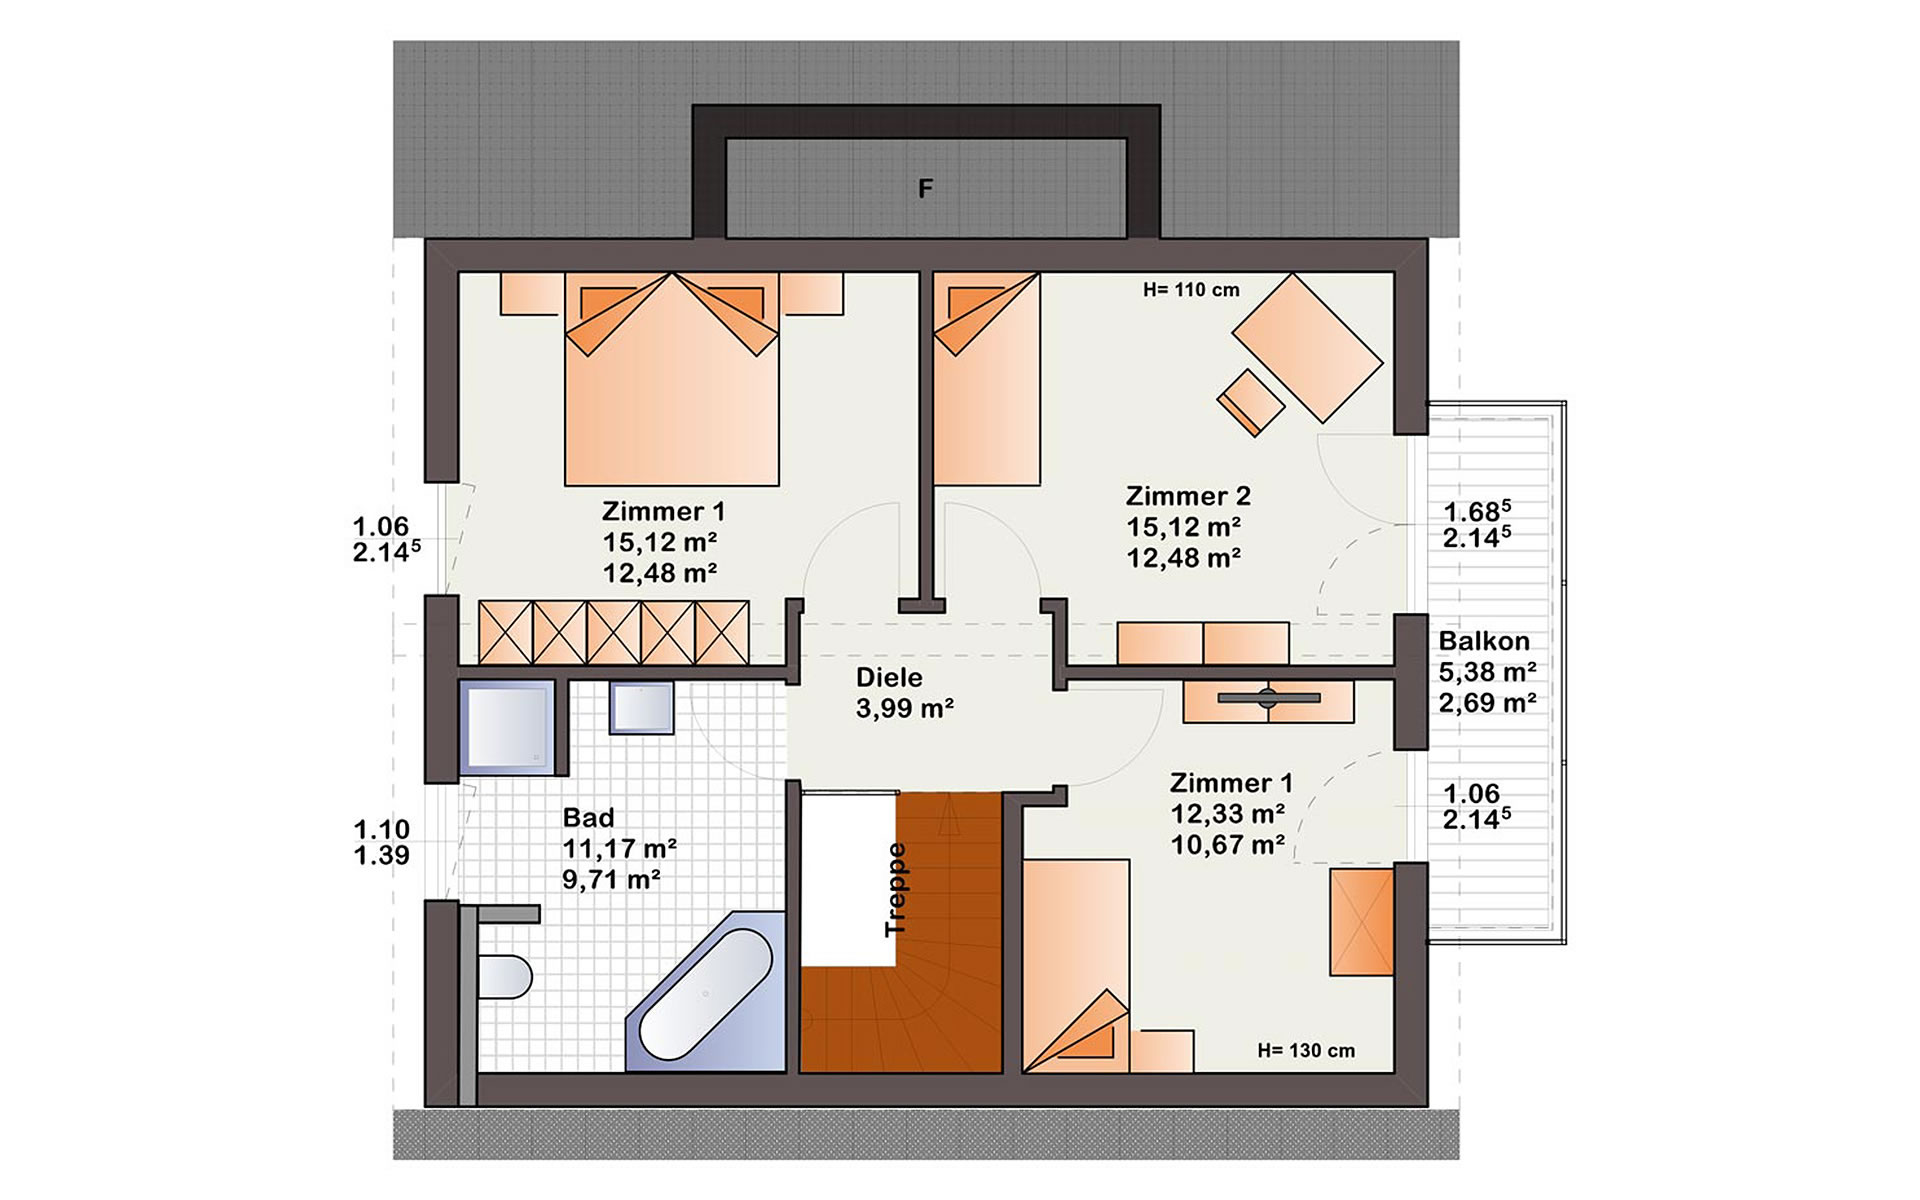 Dachgeschoss Esprit 125 von Bärenhaus - das fertige Haus GmbH